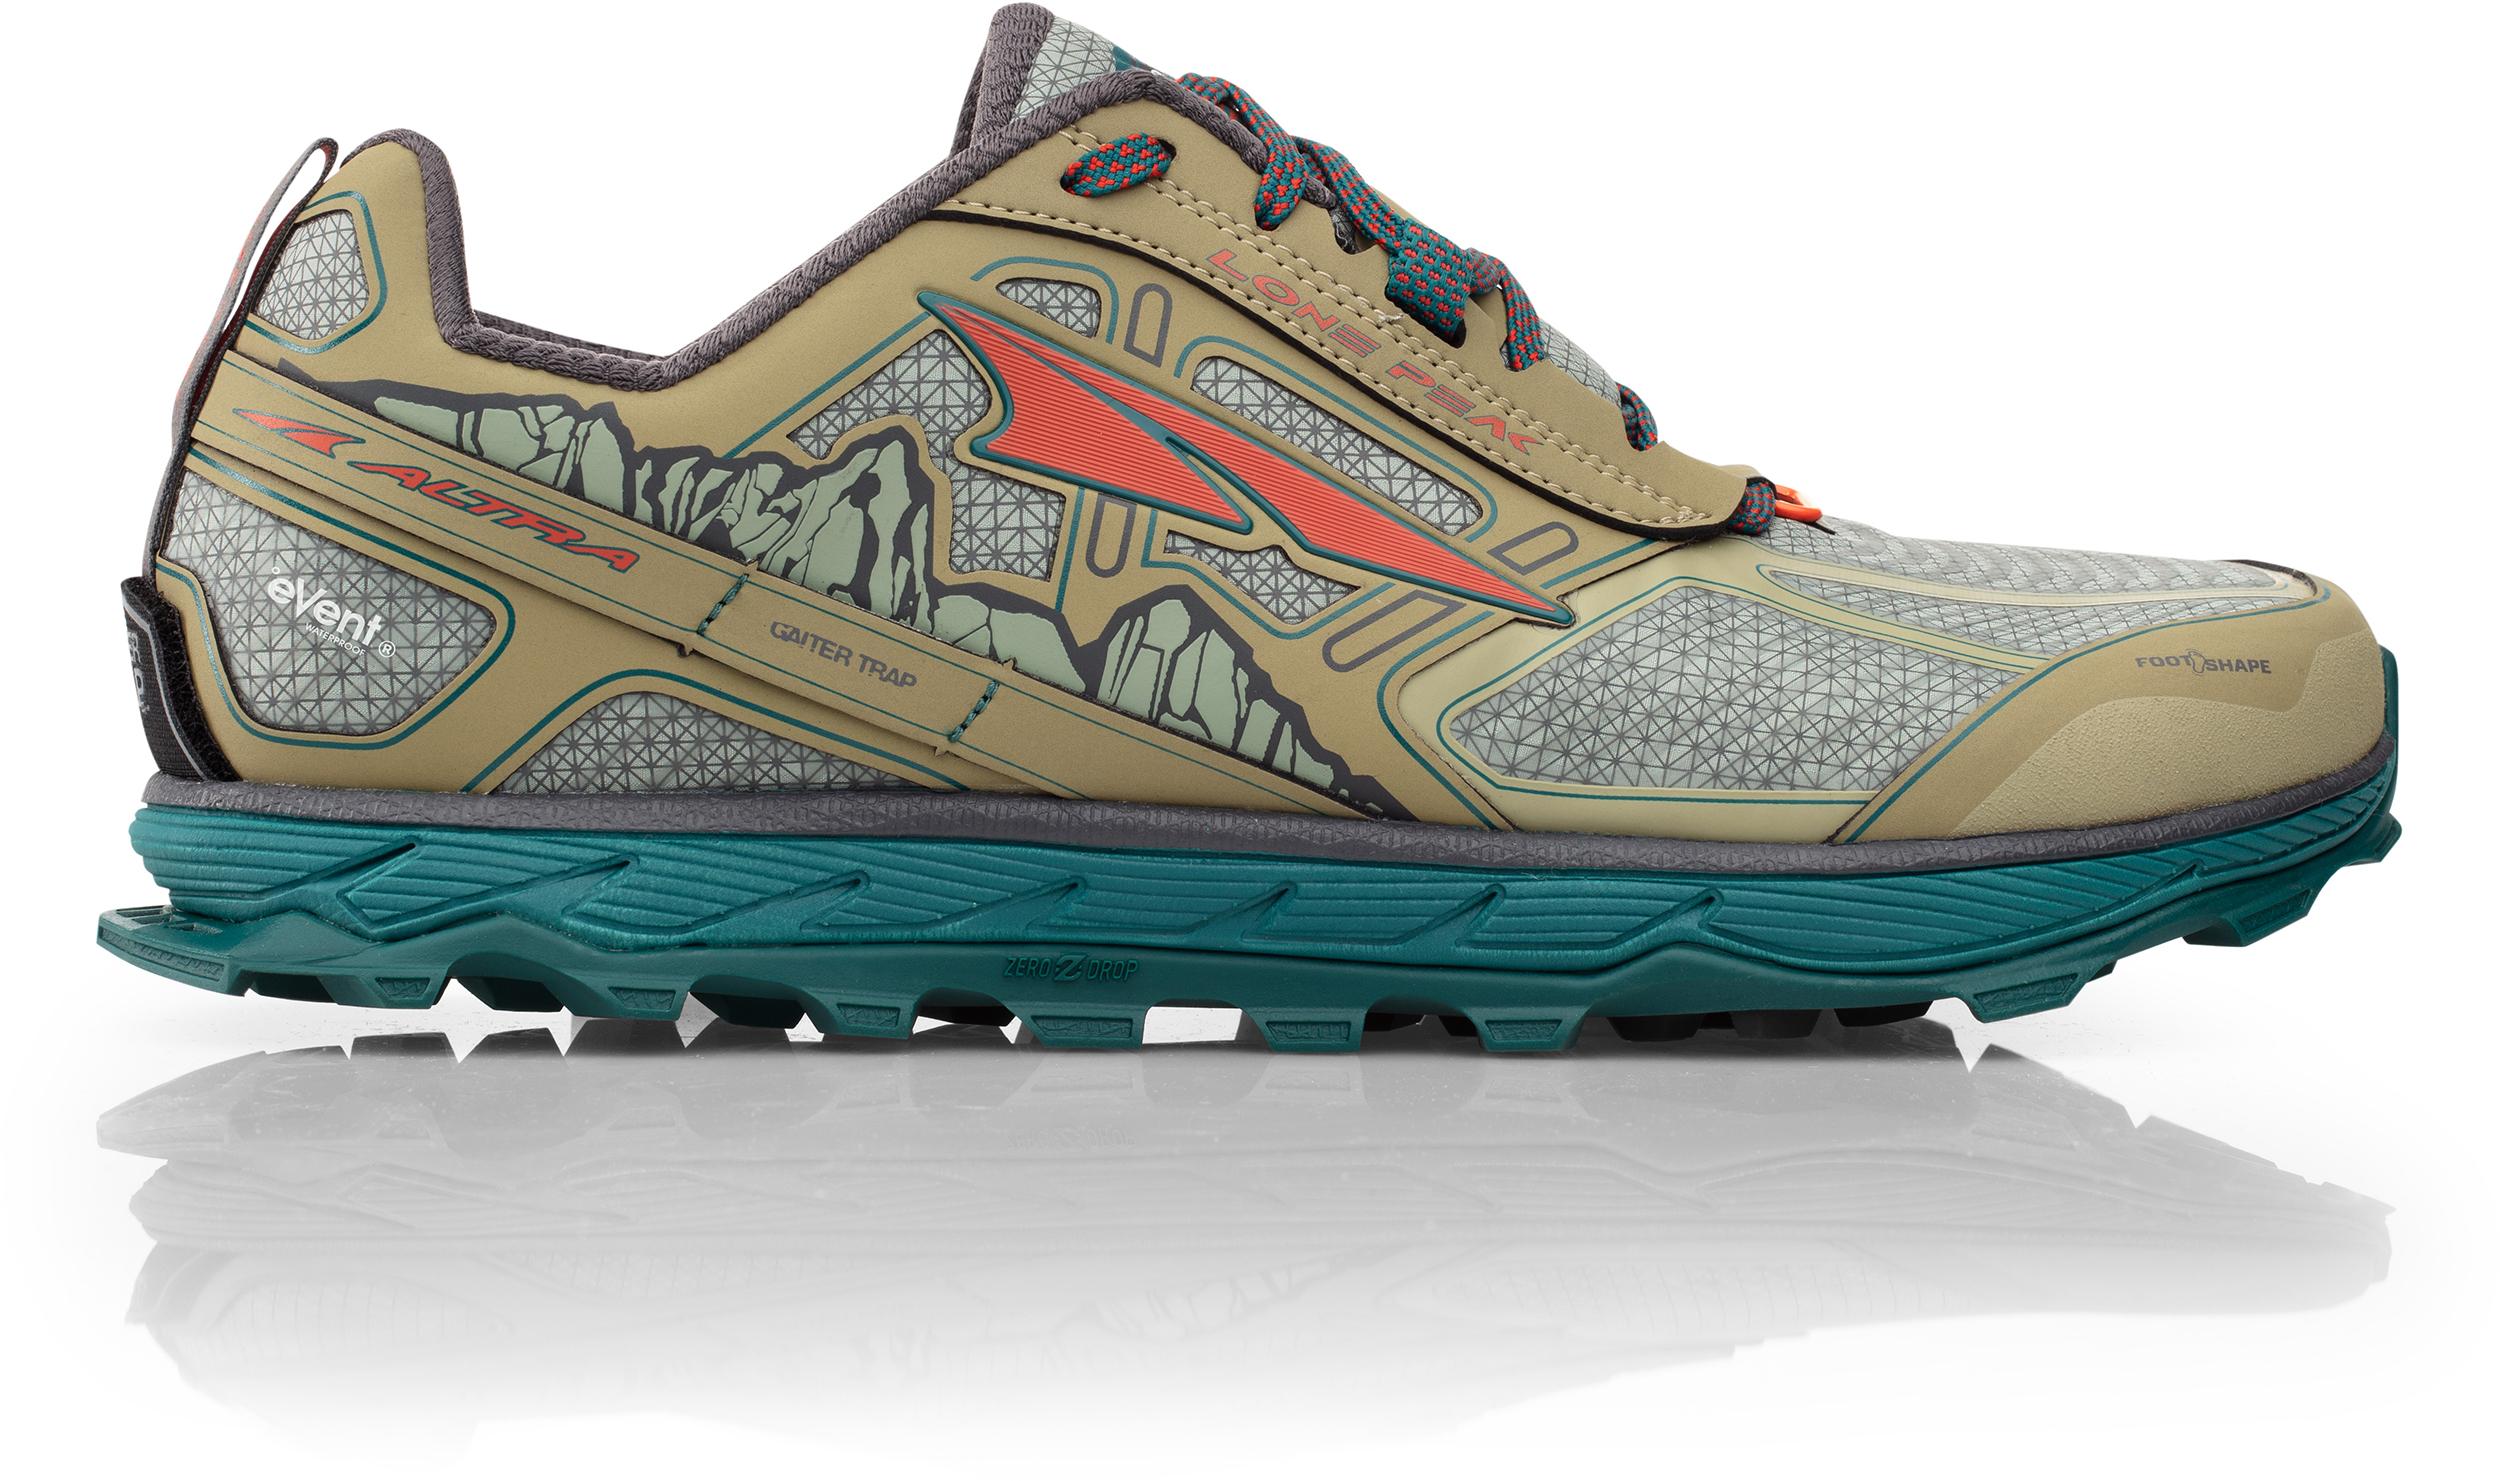 Snow Running Shoes >> Altra Lone Peak 4 Low Rain Snow Mud Waterproof Trai Men S Mec